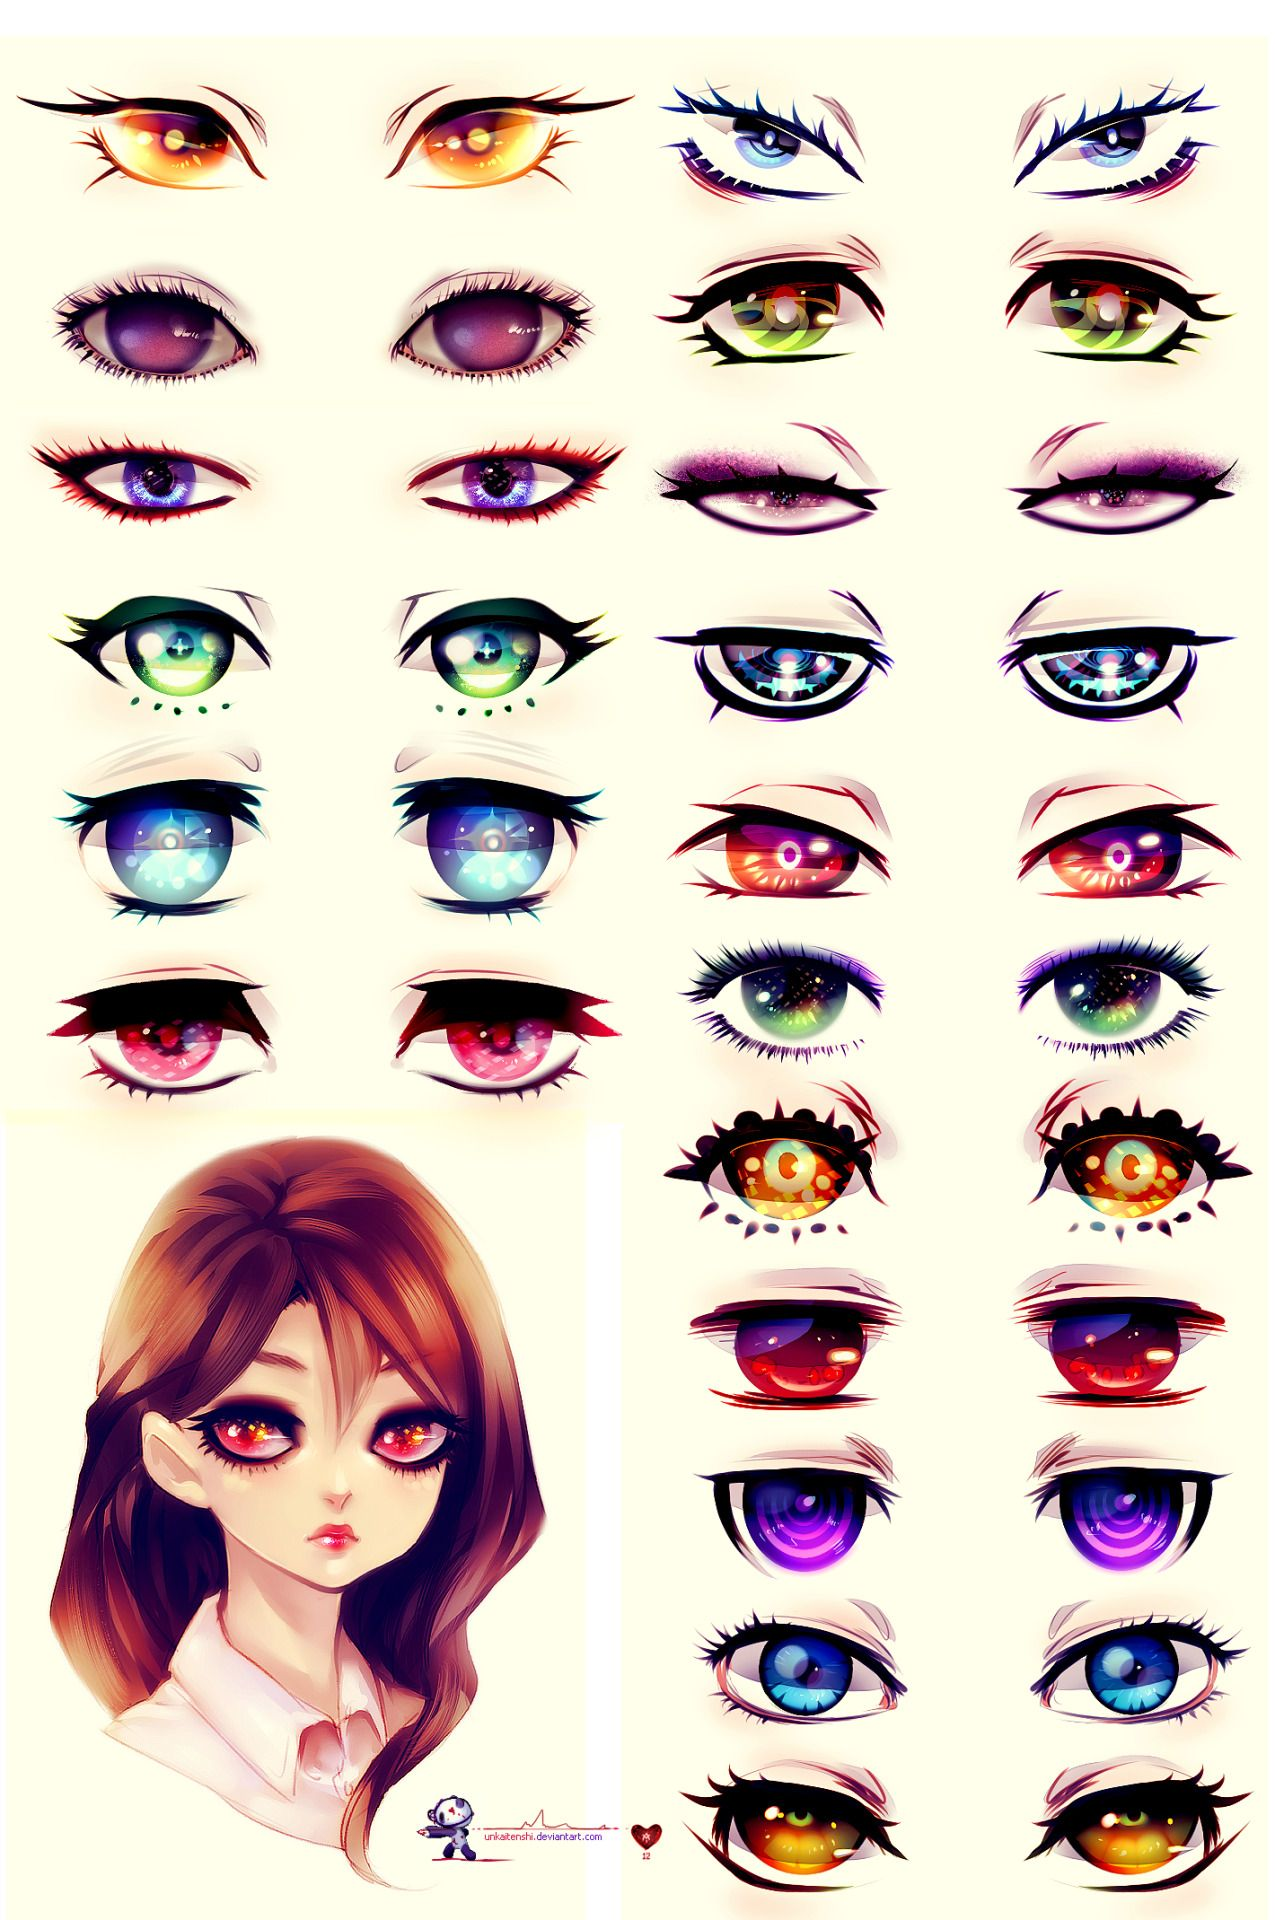 Anatoref Manga Eyes Top Image Row 2 Left Right Row 3